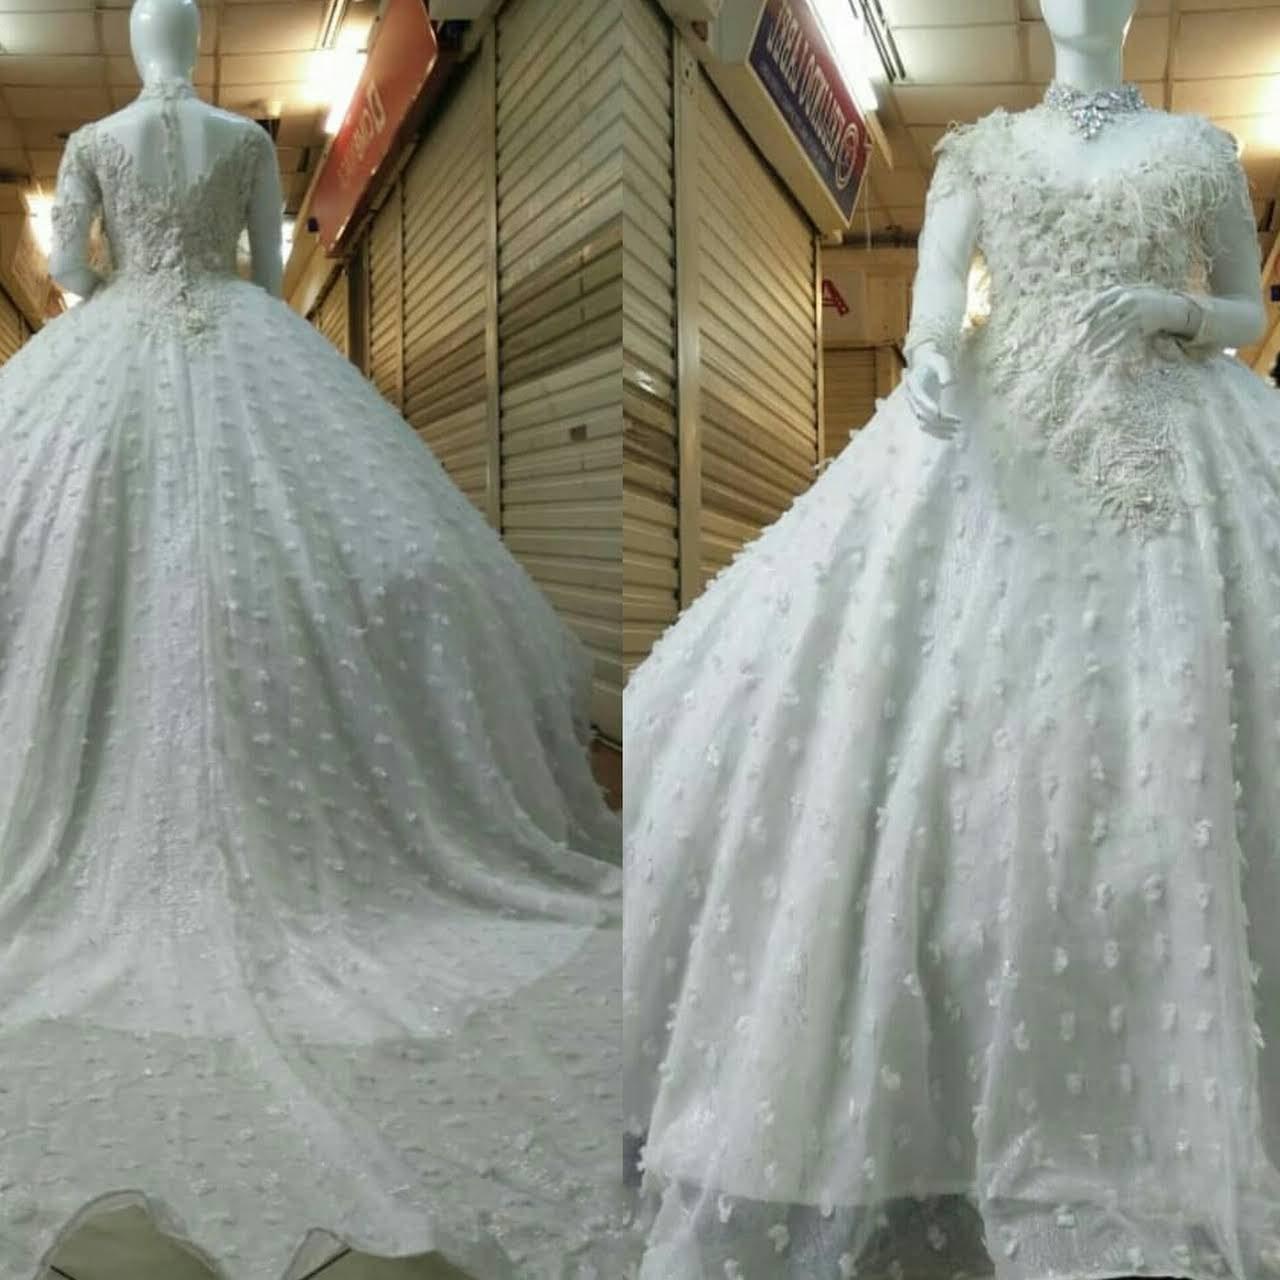 Design Sewa Baju Pengantin Muslimah Di Depok Drdp Gaun Kebaya Pengantin Muslimah Hijab Syari Layanan Belanja